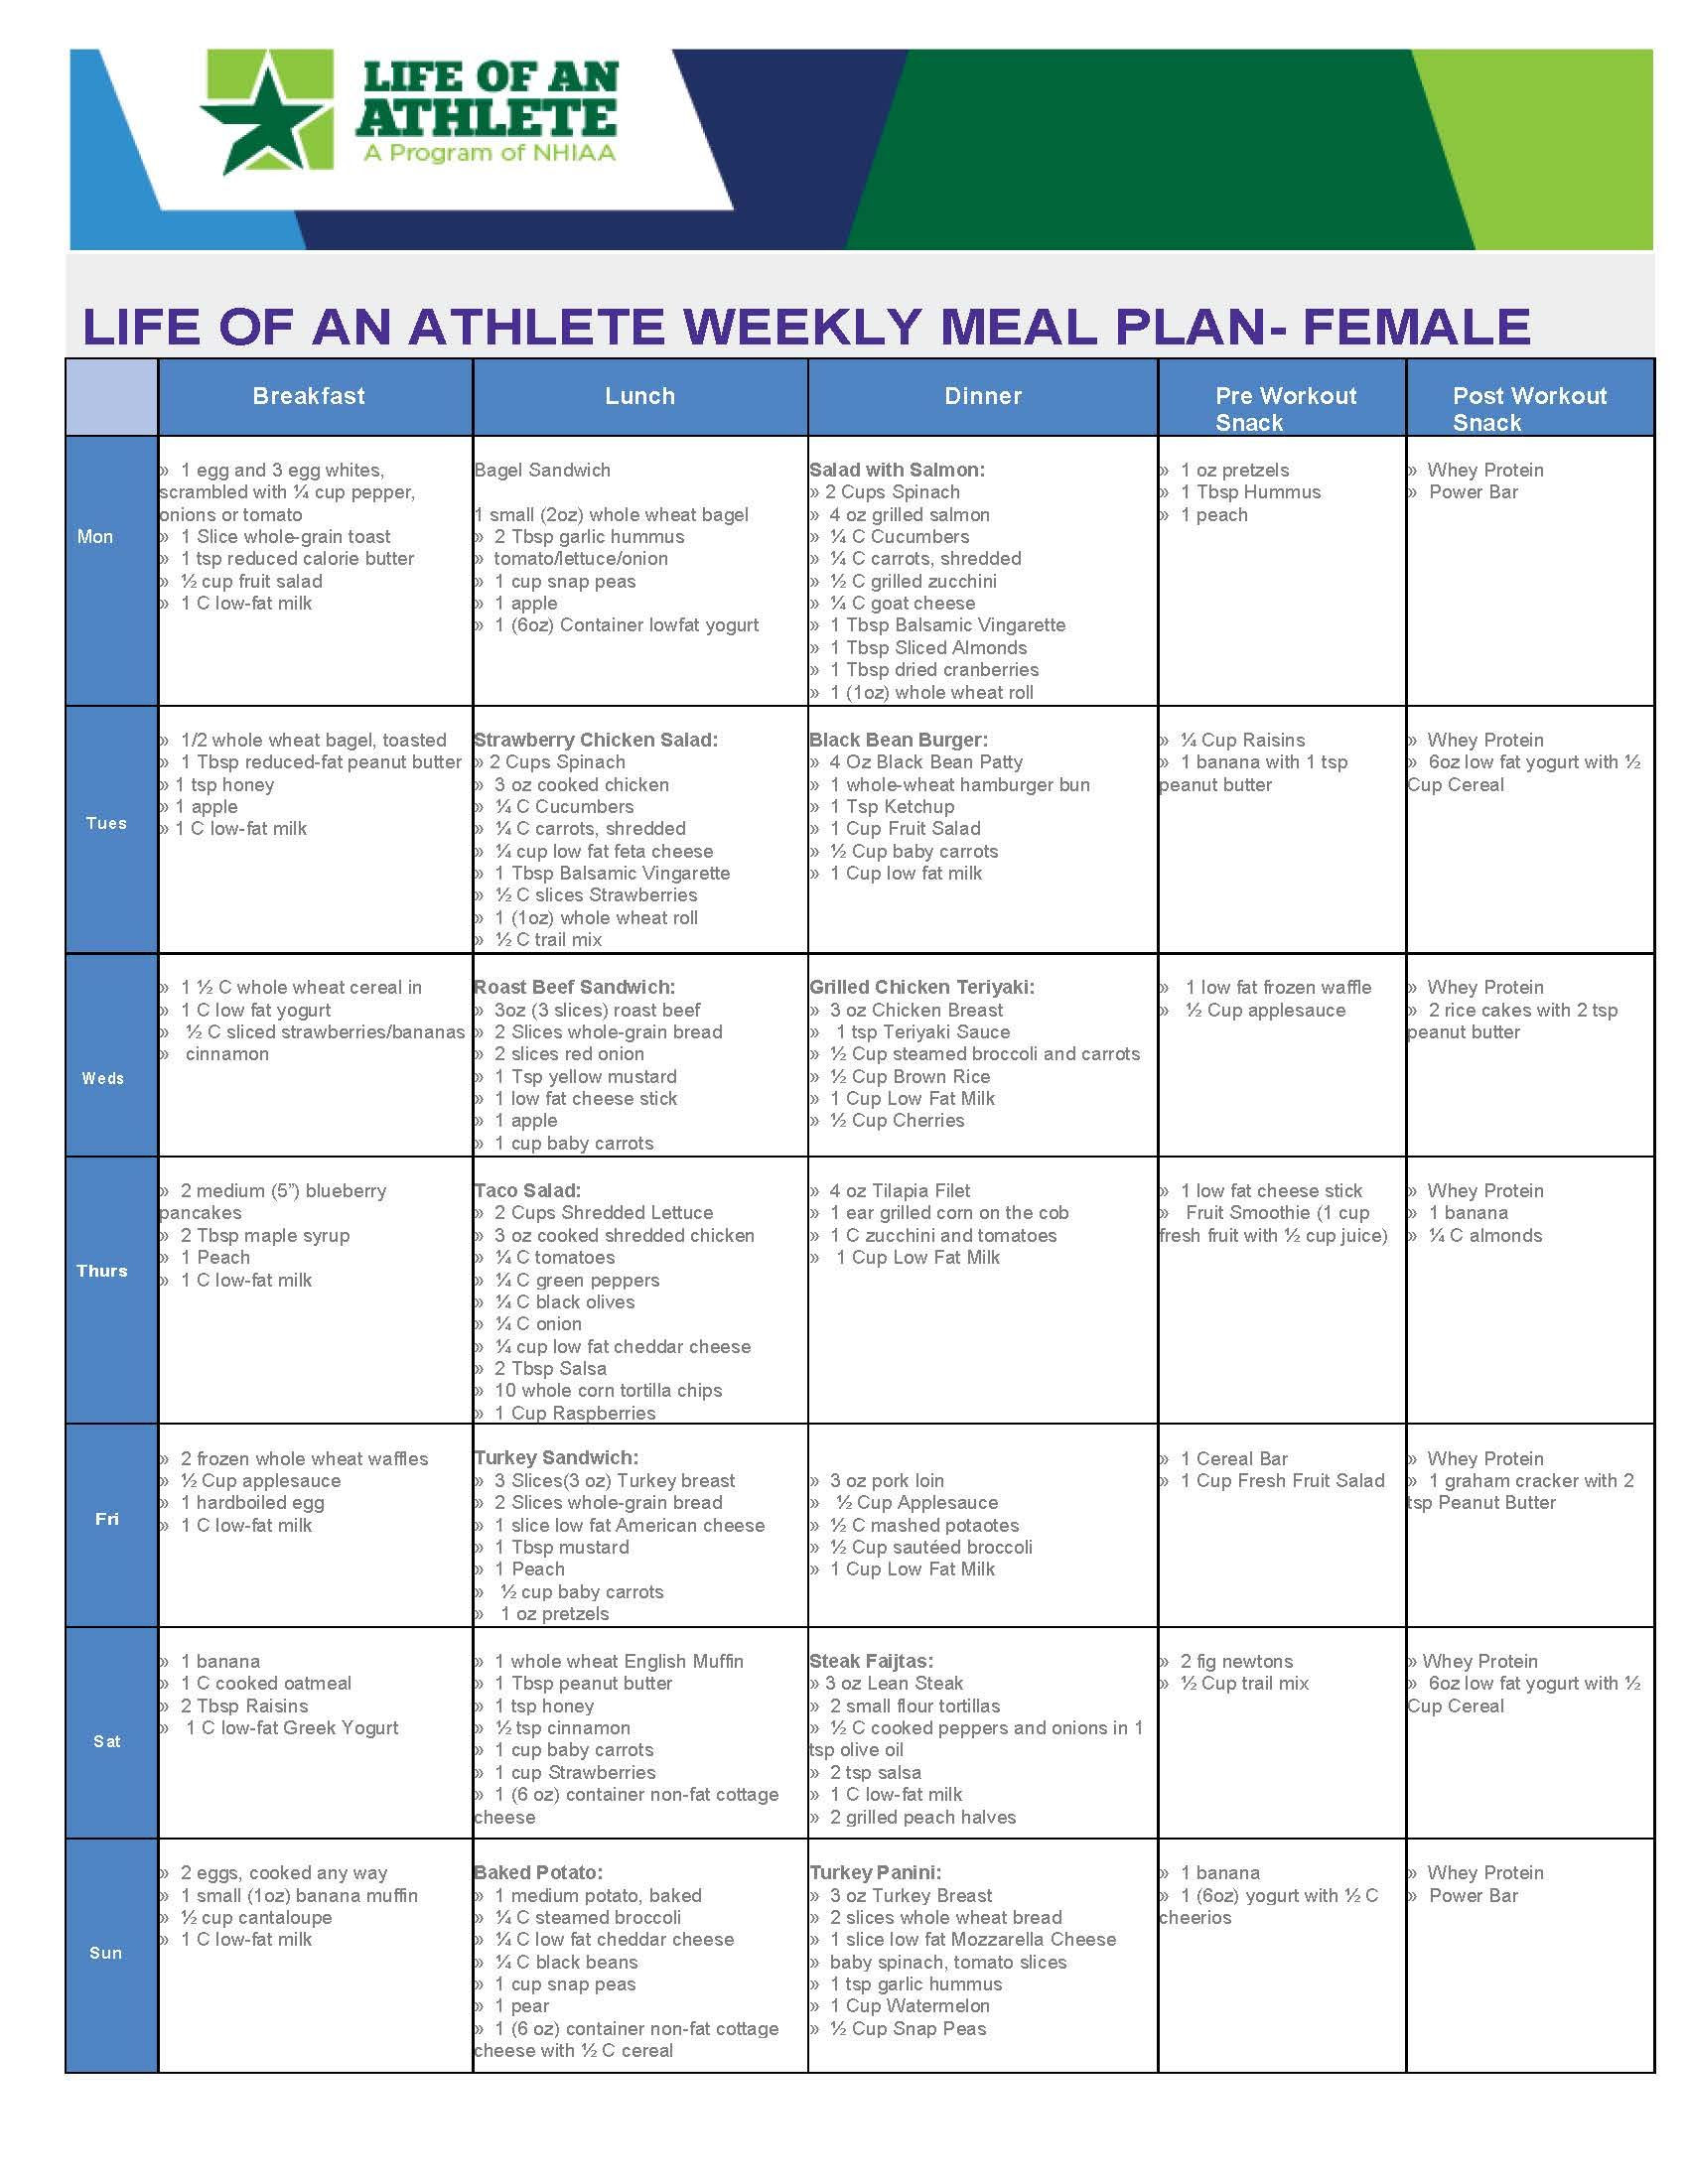 Vegan Diet Plan For Athletes  LOA weekly meal plan for female athlete week 5